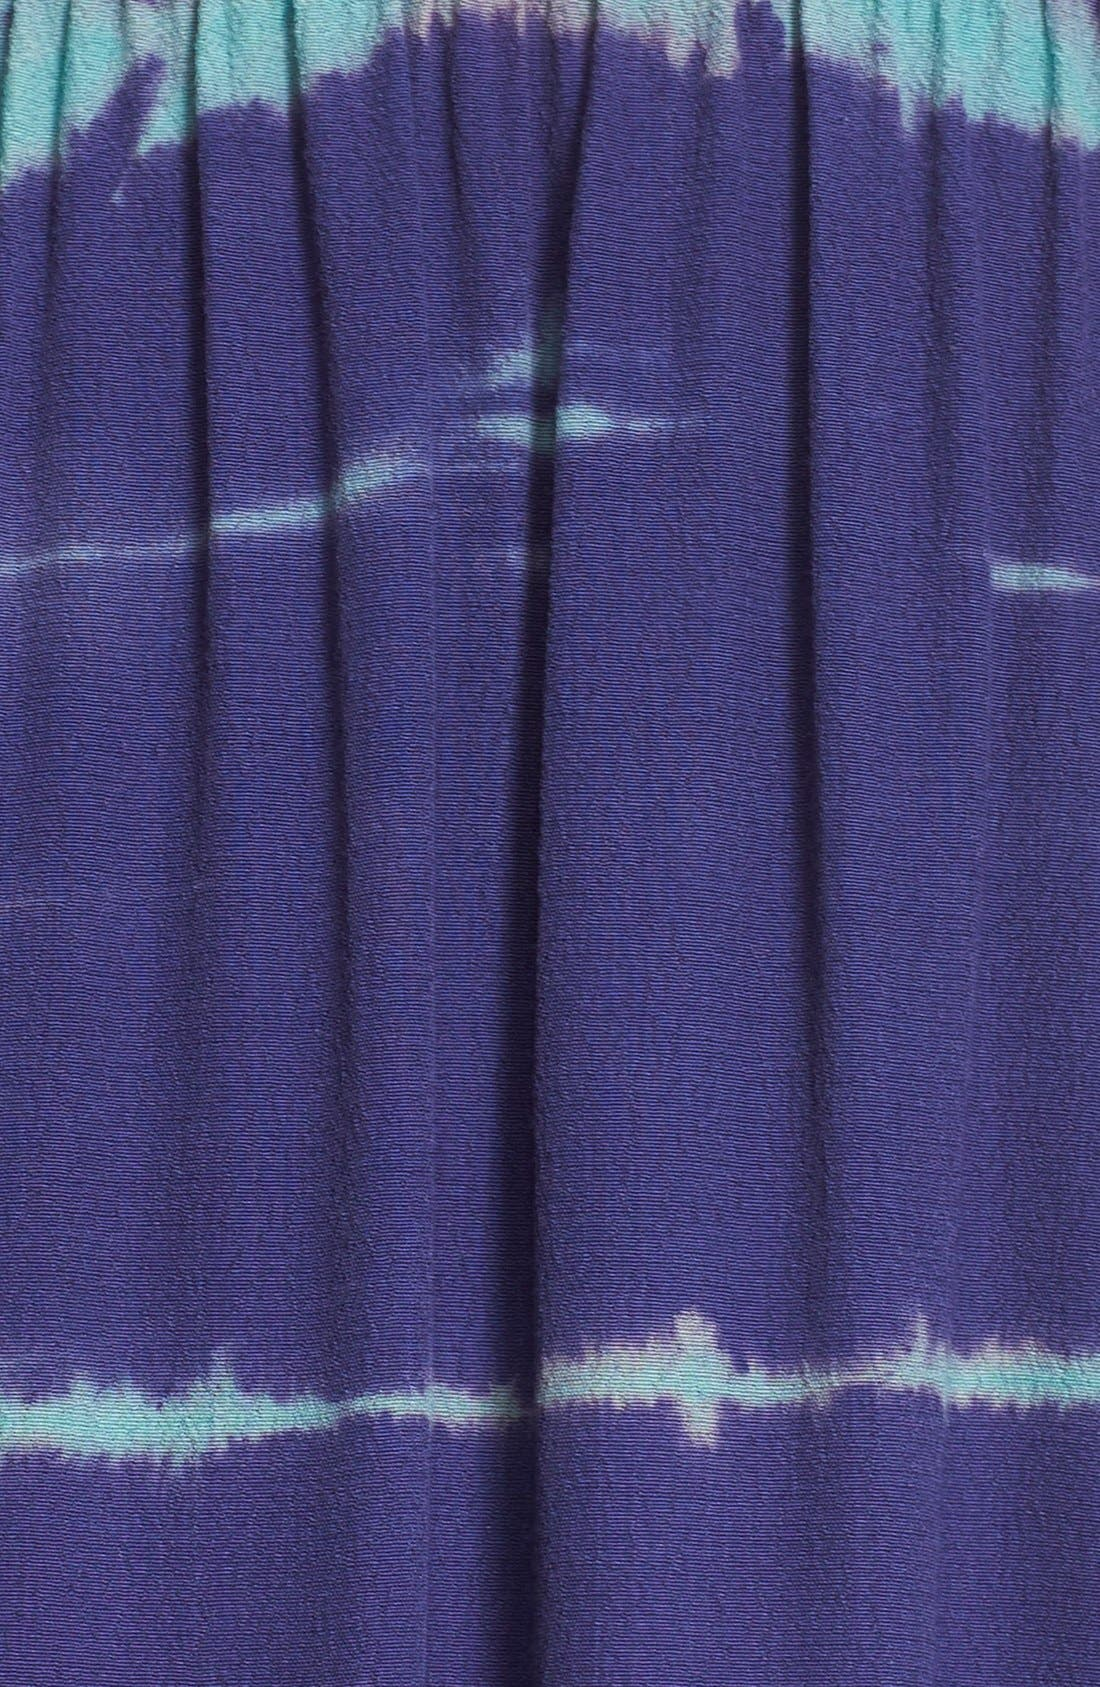 Tie Dye Crepe Maxi Dress,                             Alternate thumbnail 5, color,                             410